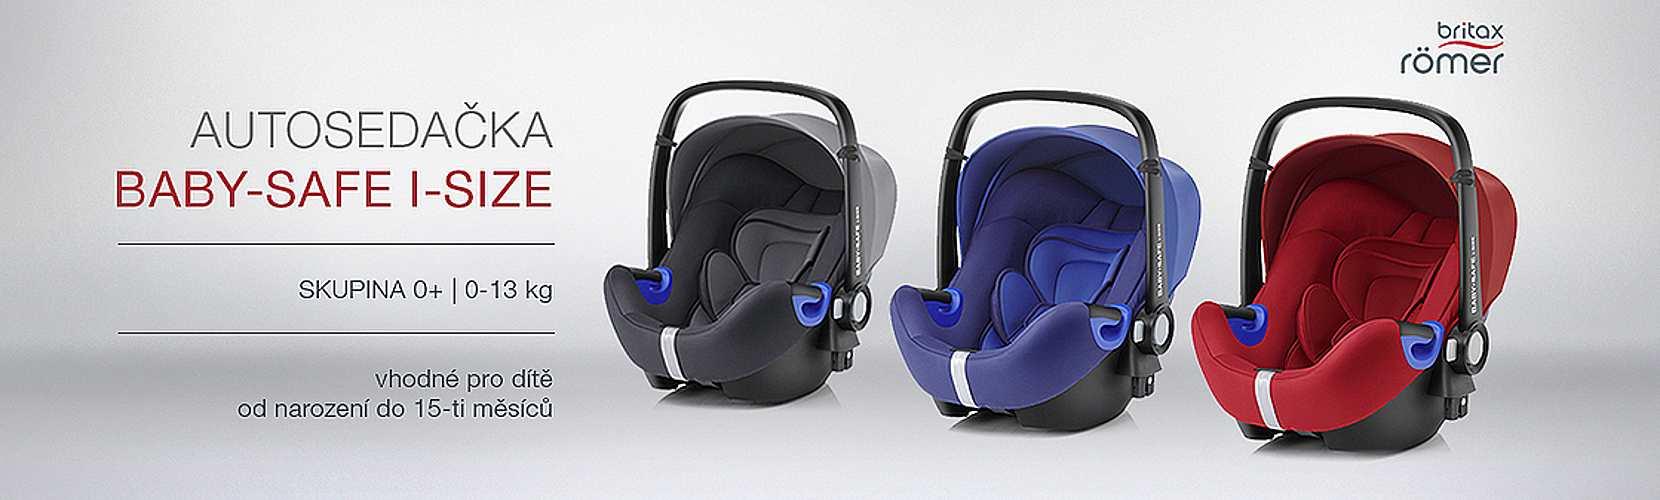 katka obchod pro miminko oble en a pot eby pro kojence plze. Black Bedroom Furniture Sets. Home Design Ideas